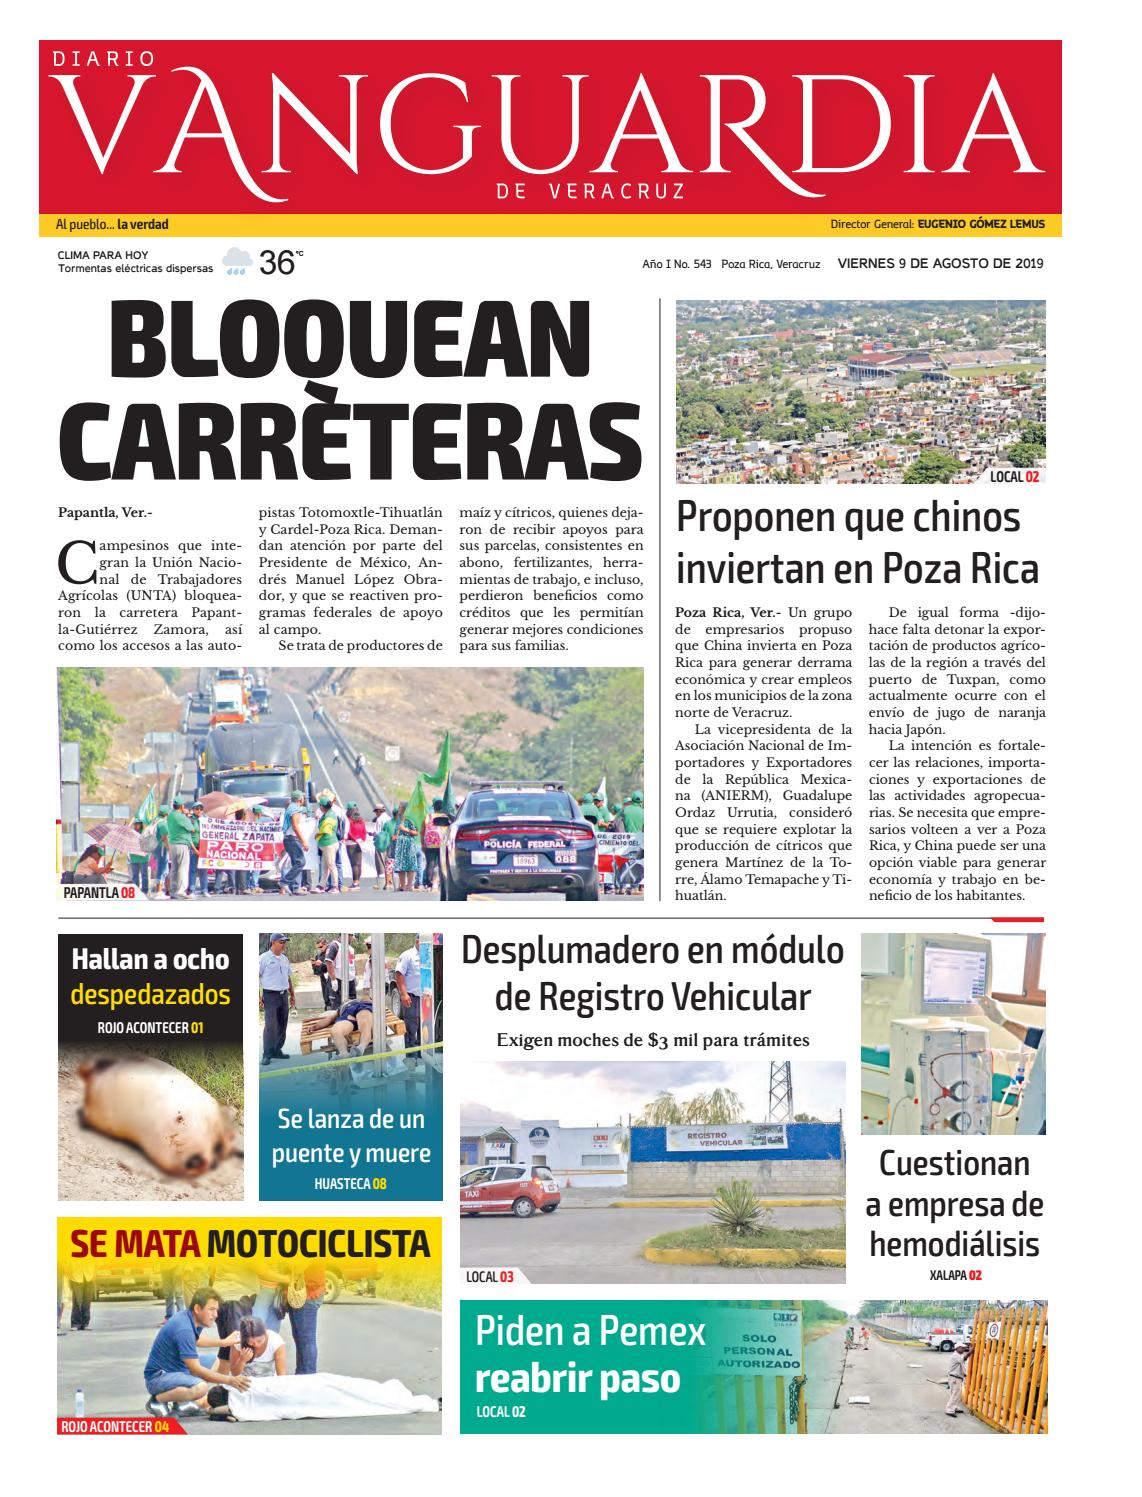 Conocer Chavas Xalapa 704992